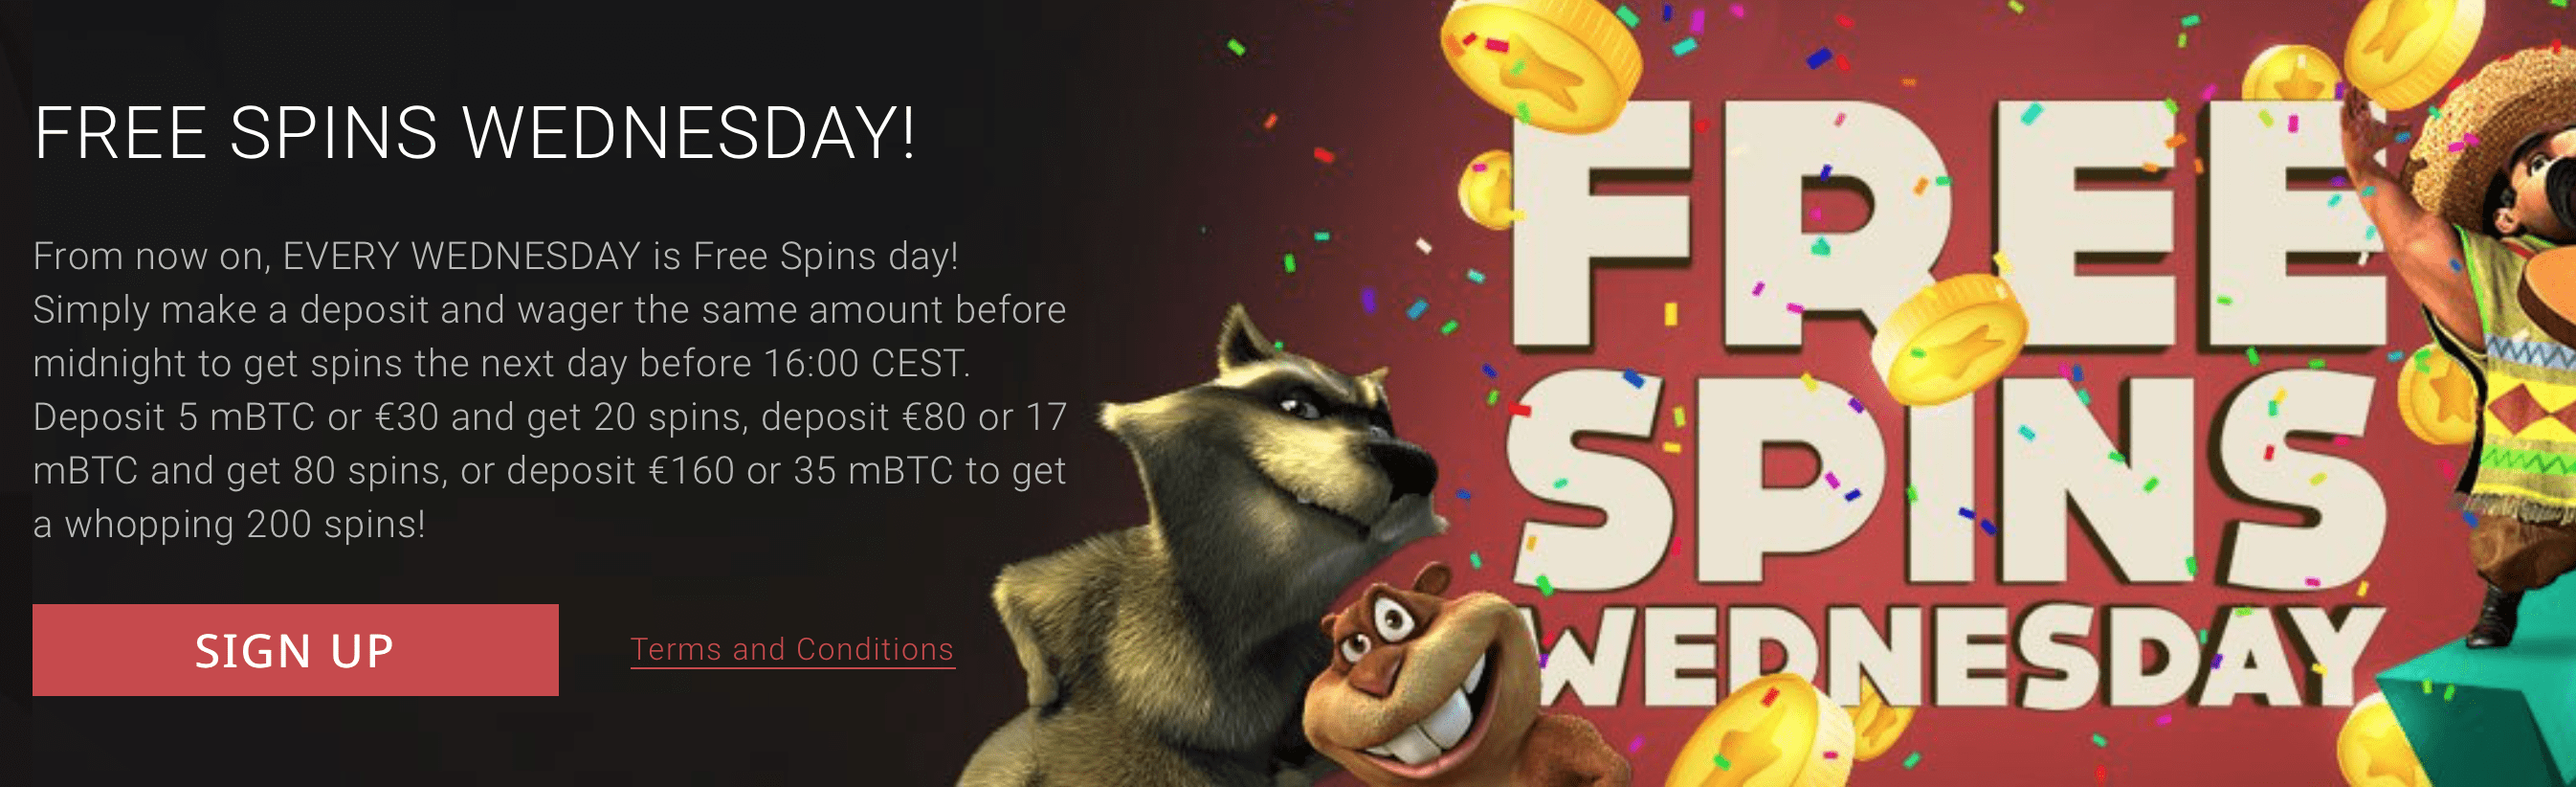 Take part in free spin Wednesdays at BitStarz Casino